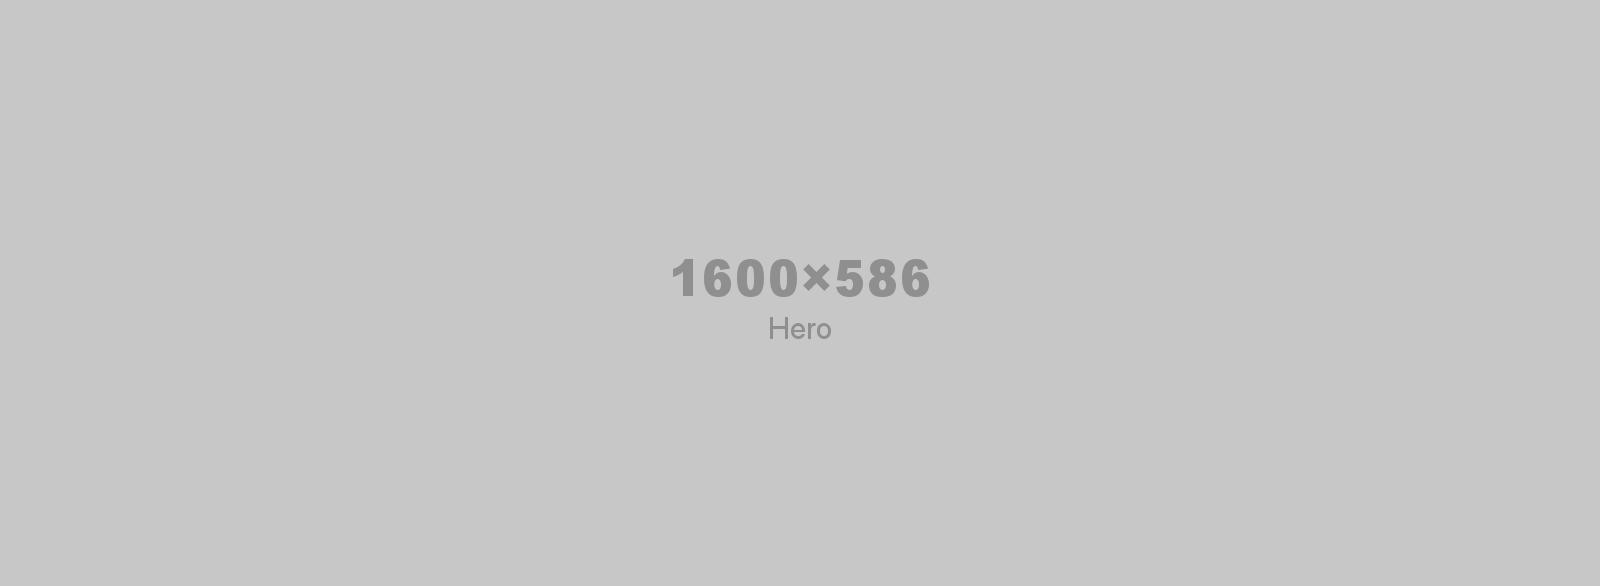 1600x586